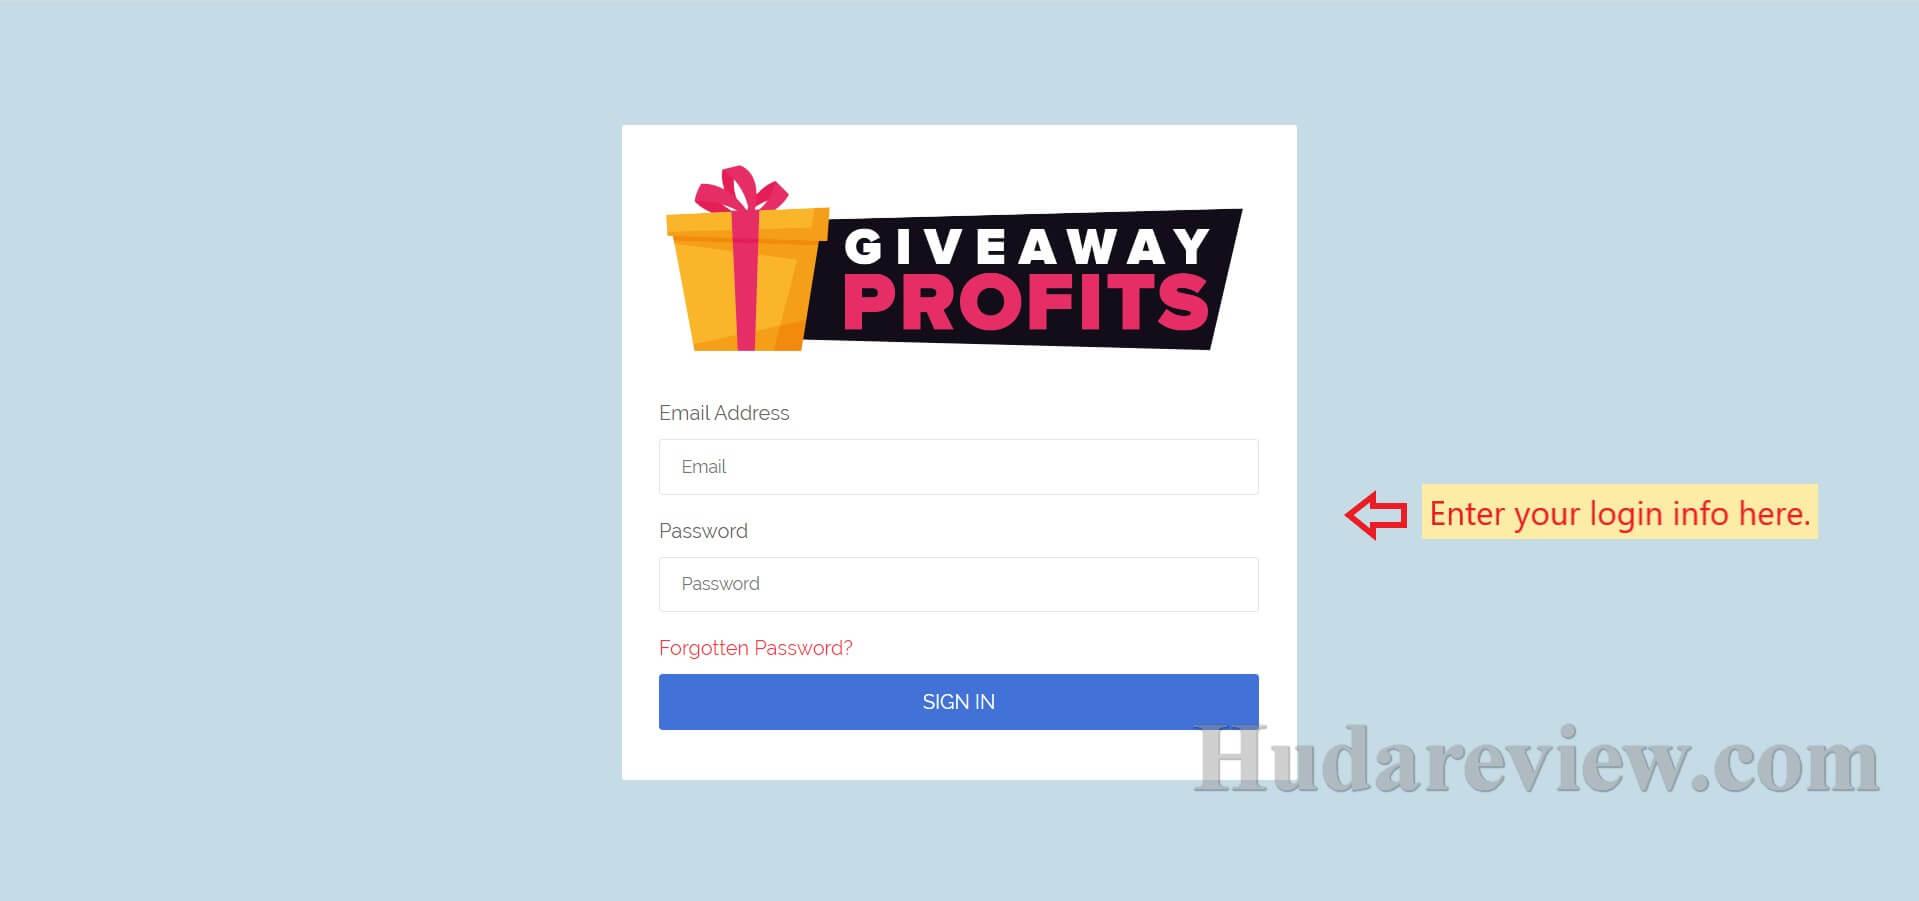 Giveaway-Profits-Review-1-1